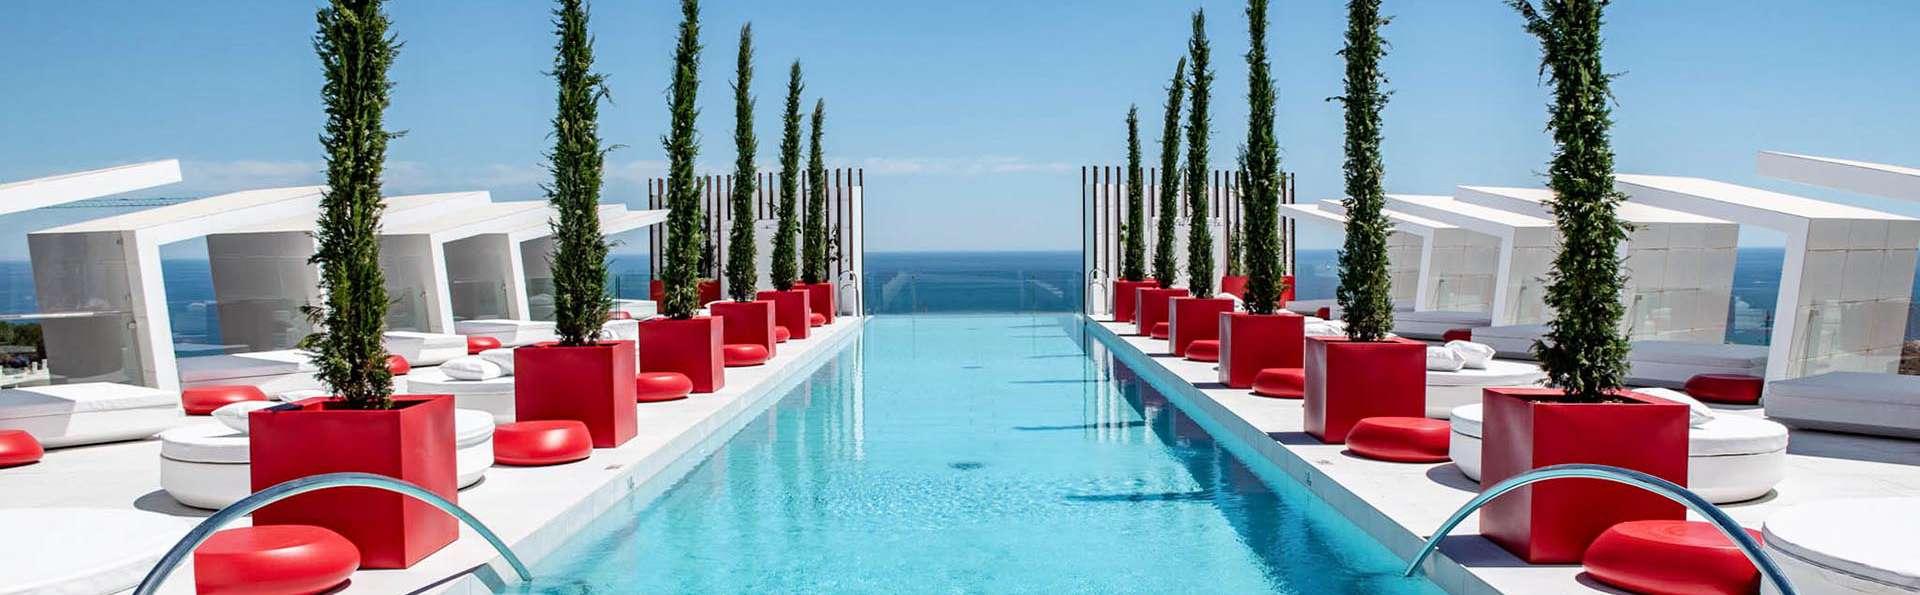 Higuerón hotel Málaga, Curio Collection by HILTON  - EDIT_Piscina_Infinity_01.jpg